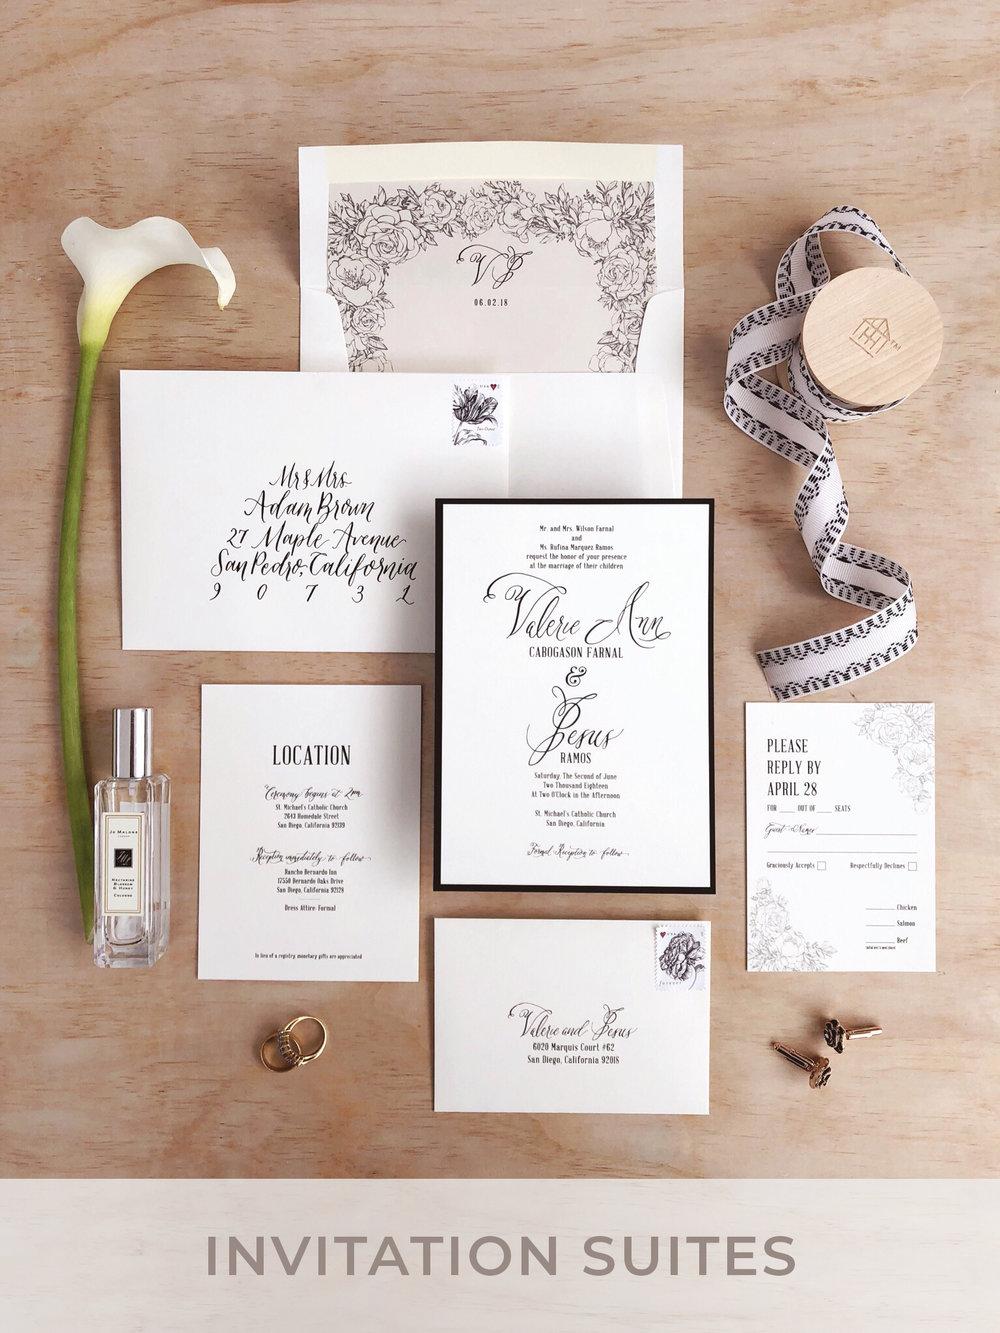 Custom Invitation Suites